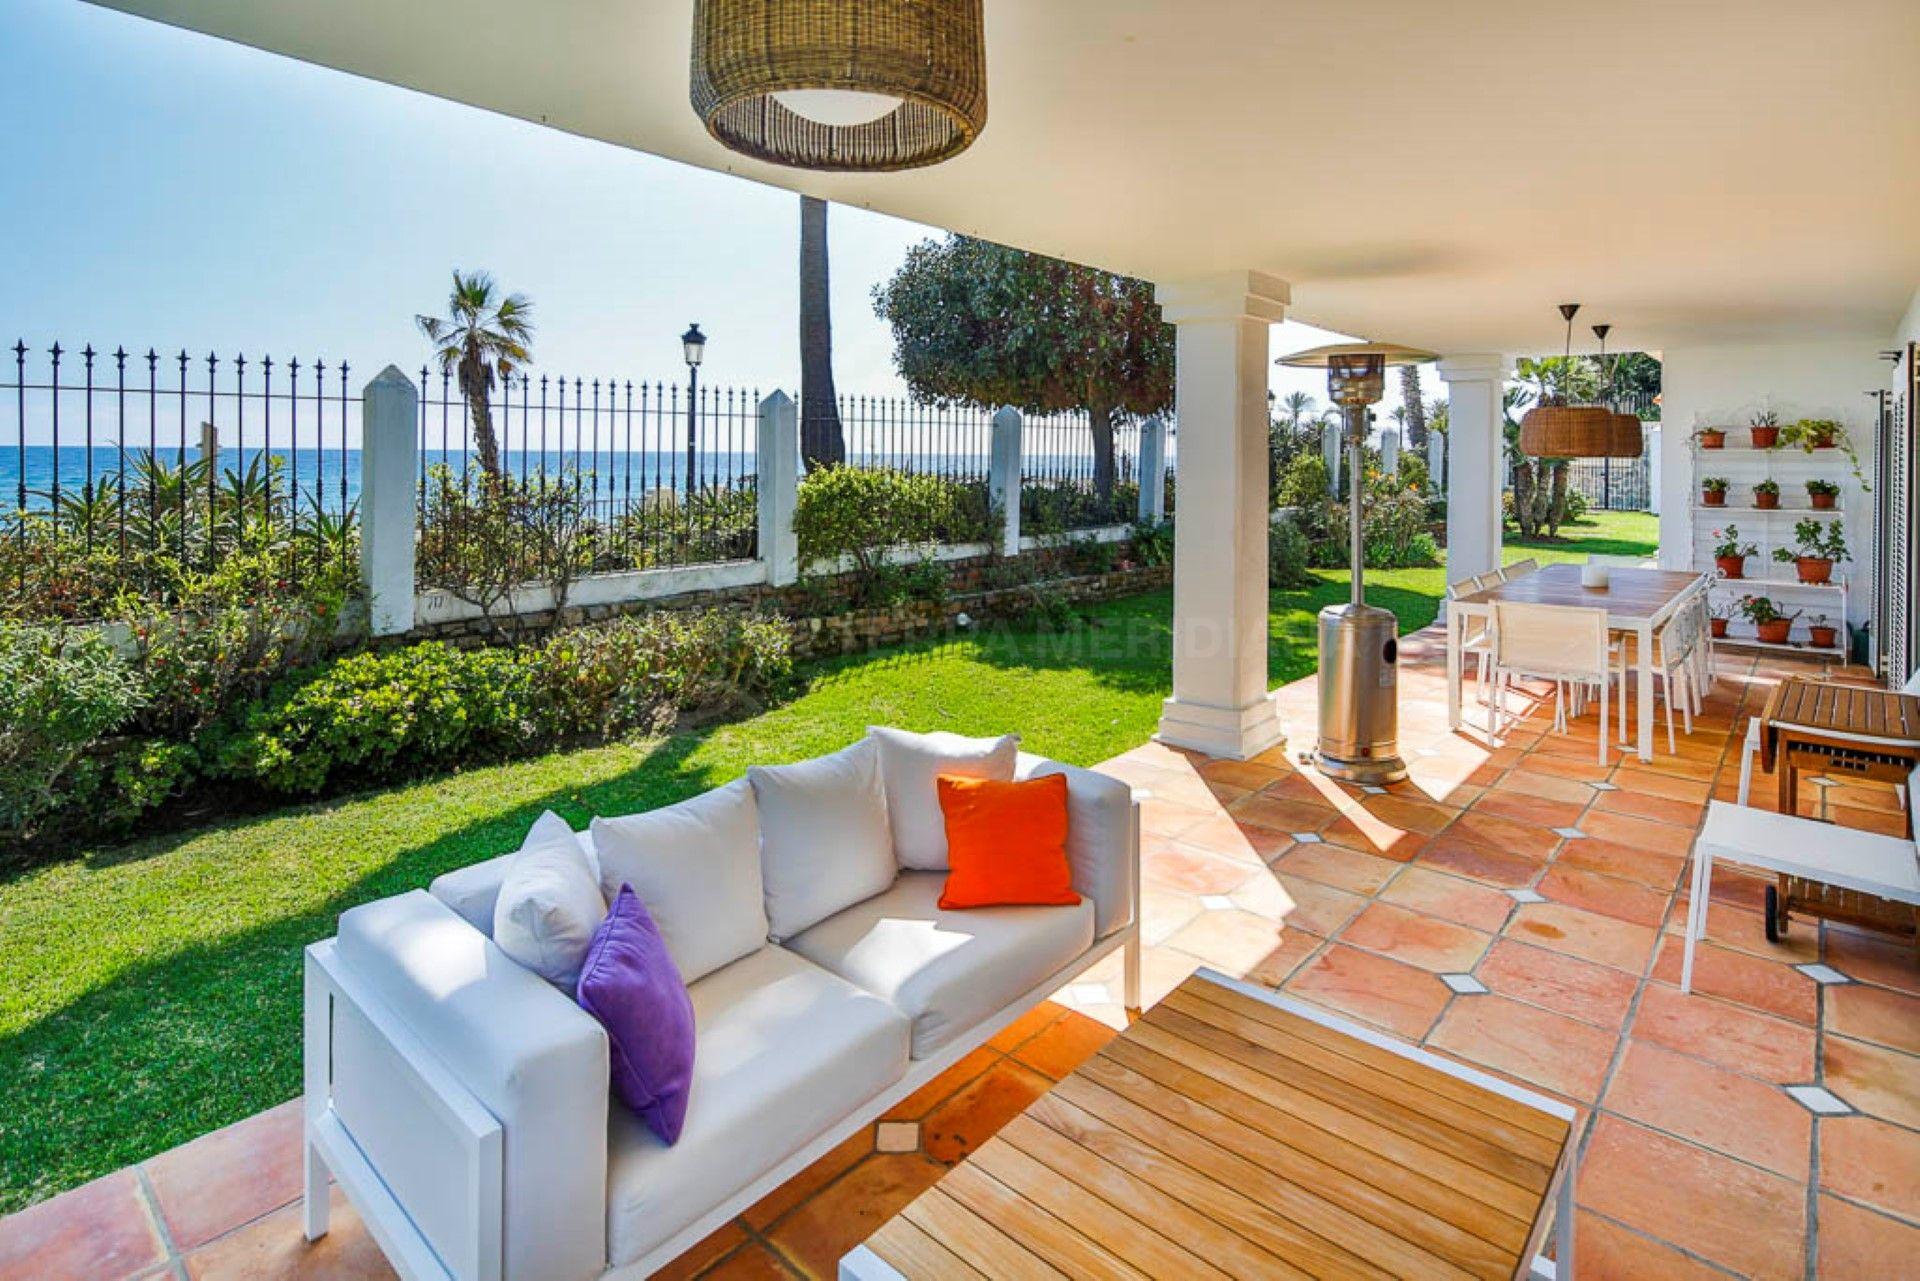 frontline villa for sale on the golden mile steps from puente romano marbella. Black Bedroom Furniture Sets. Home Design Ideas